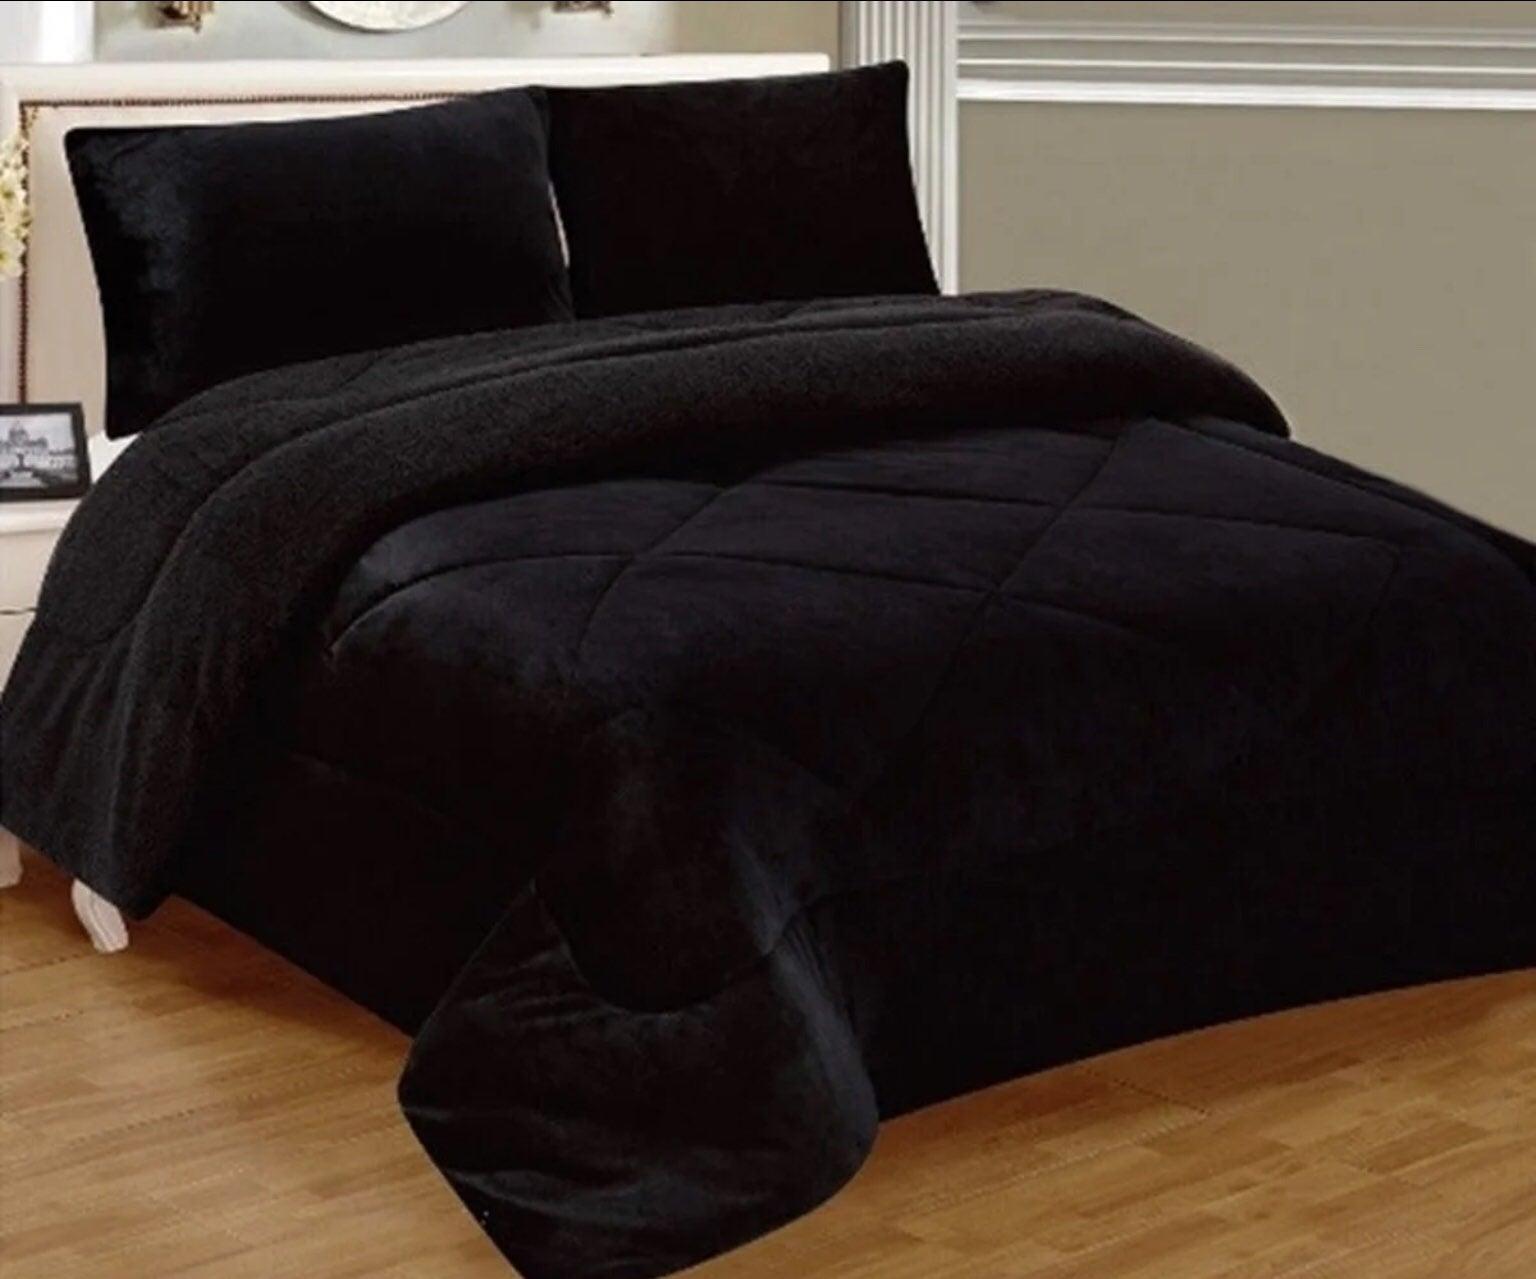 New Black Borrego Blanket Set King Size